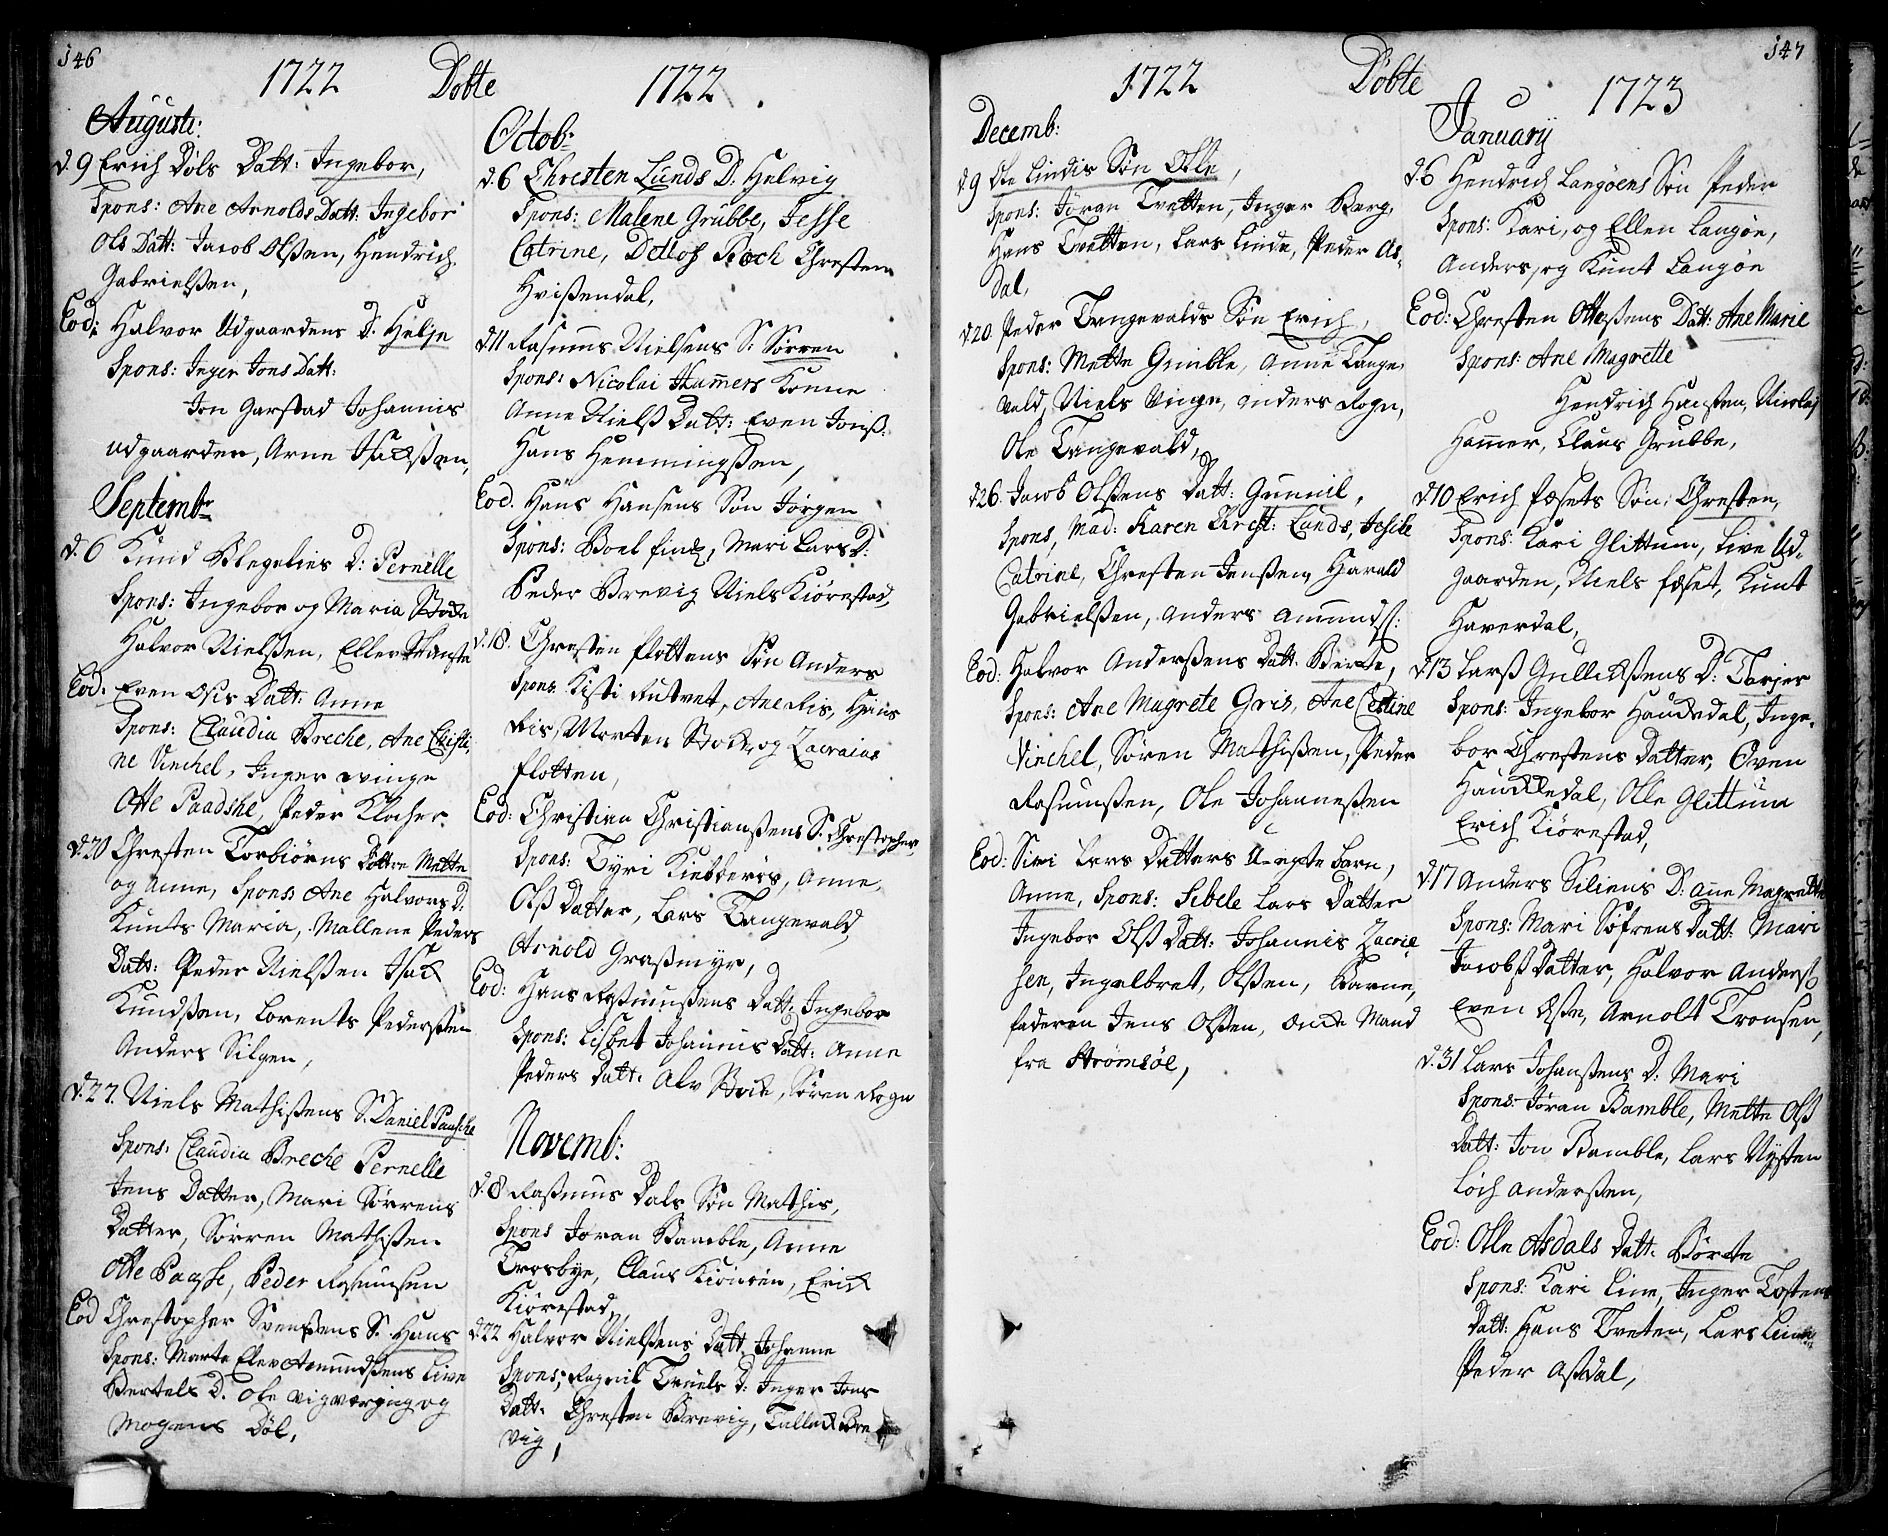 SAKO, Bamble kirkebøker, F/Fa/L0001: Ministerialbok nr. I 1, 1702-1774, s. 146-147